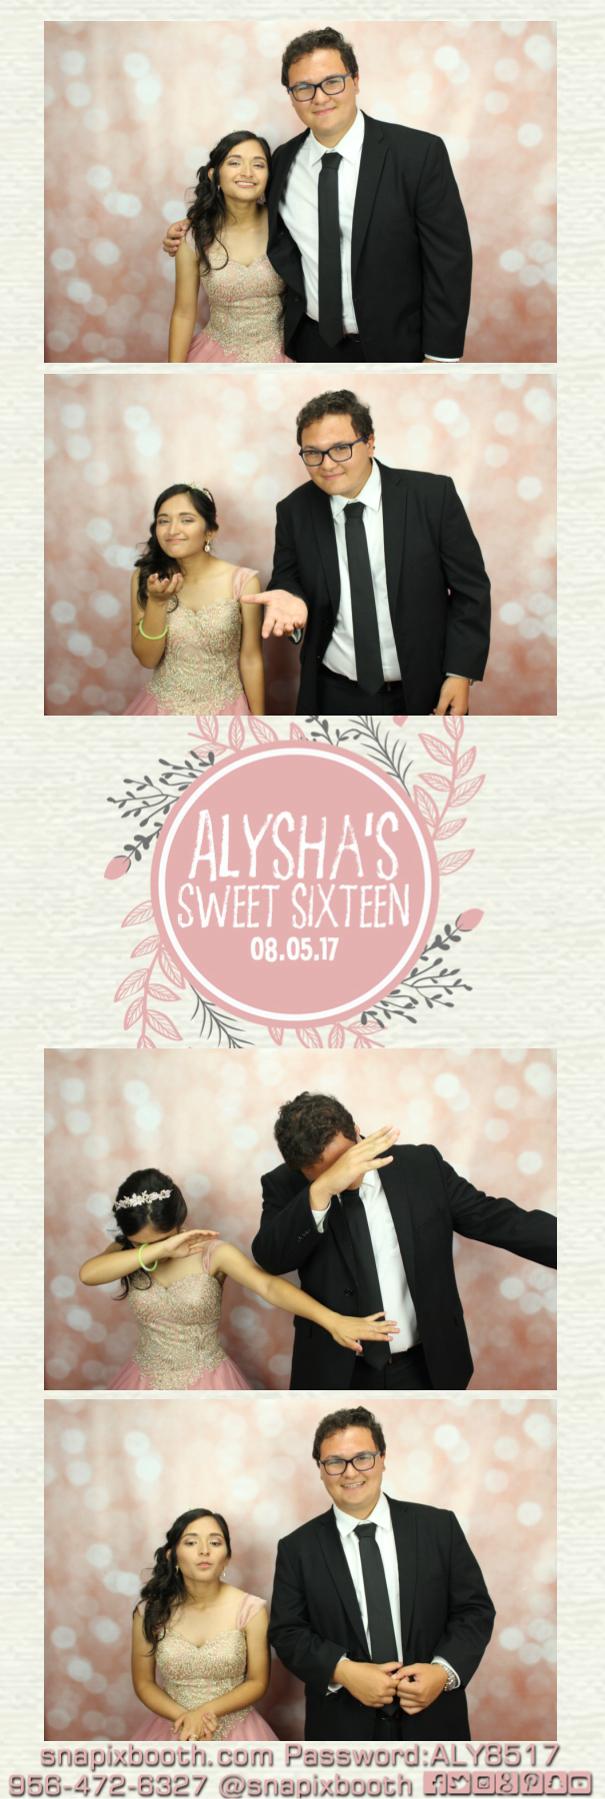 Alysha's Sweet Sixteen